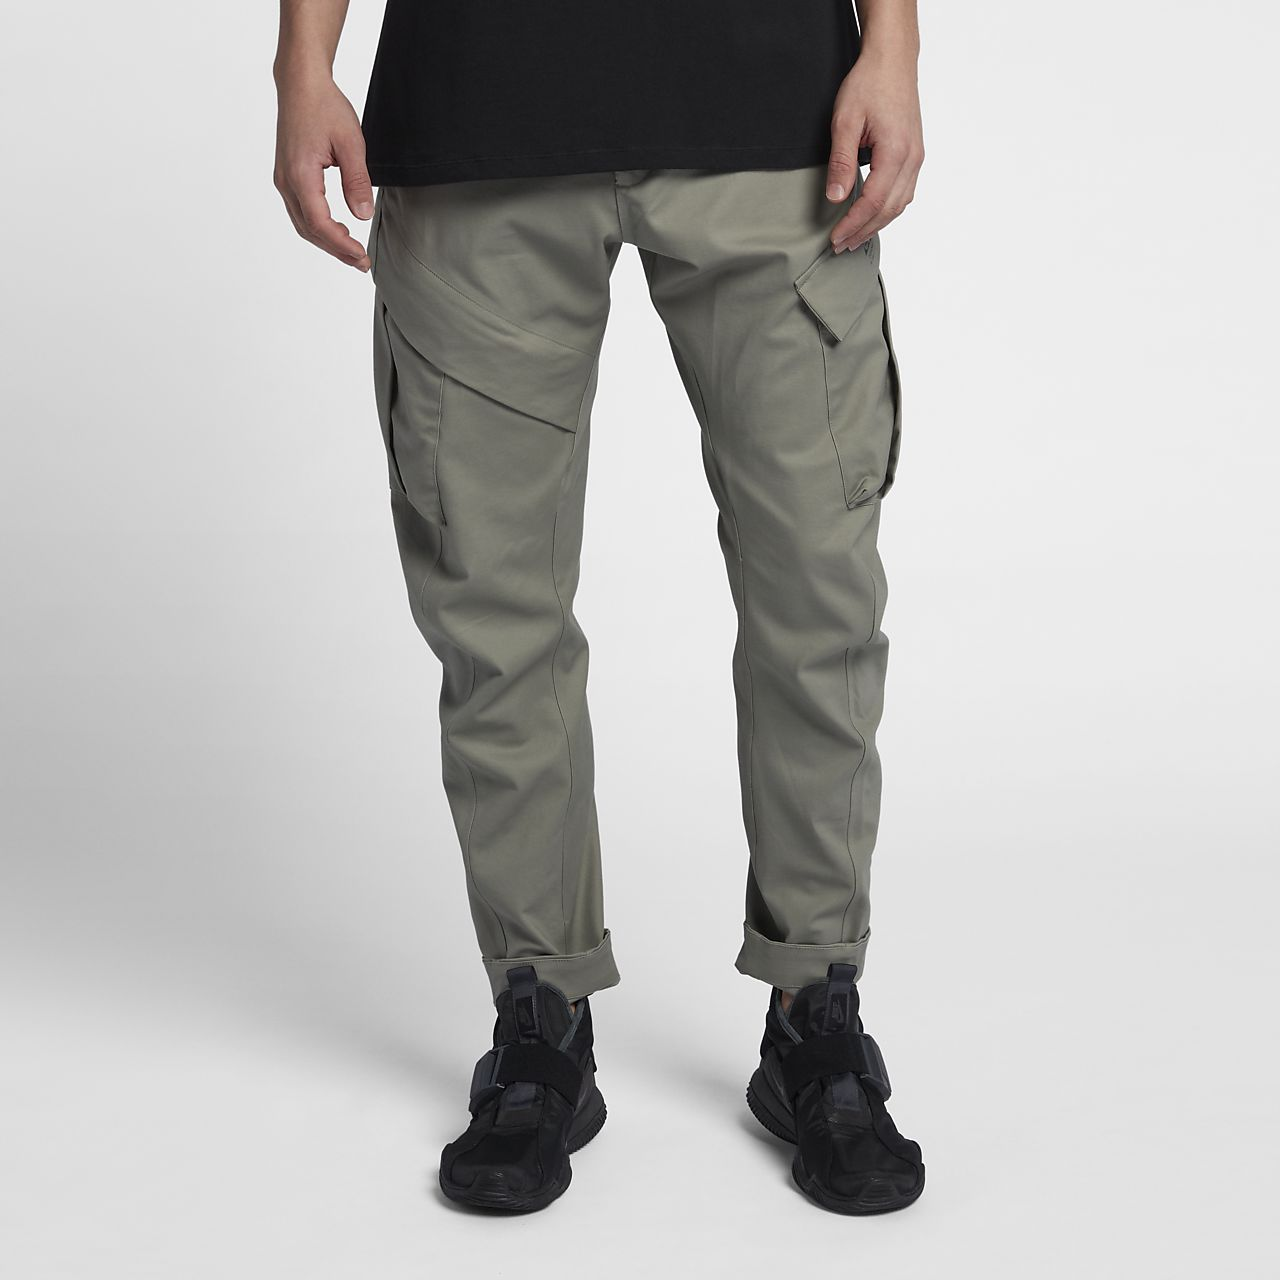 56db468637 NikeLab ACG Cargo Men's Trousers. Nike.com IN